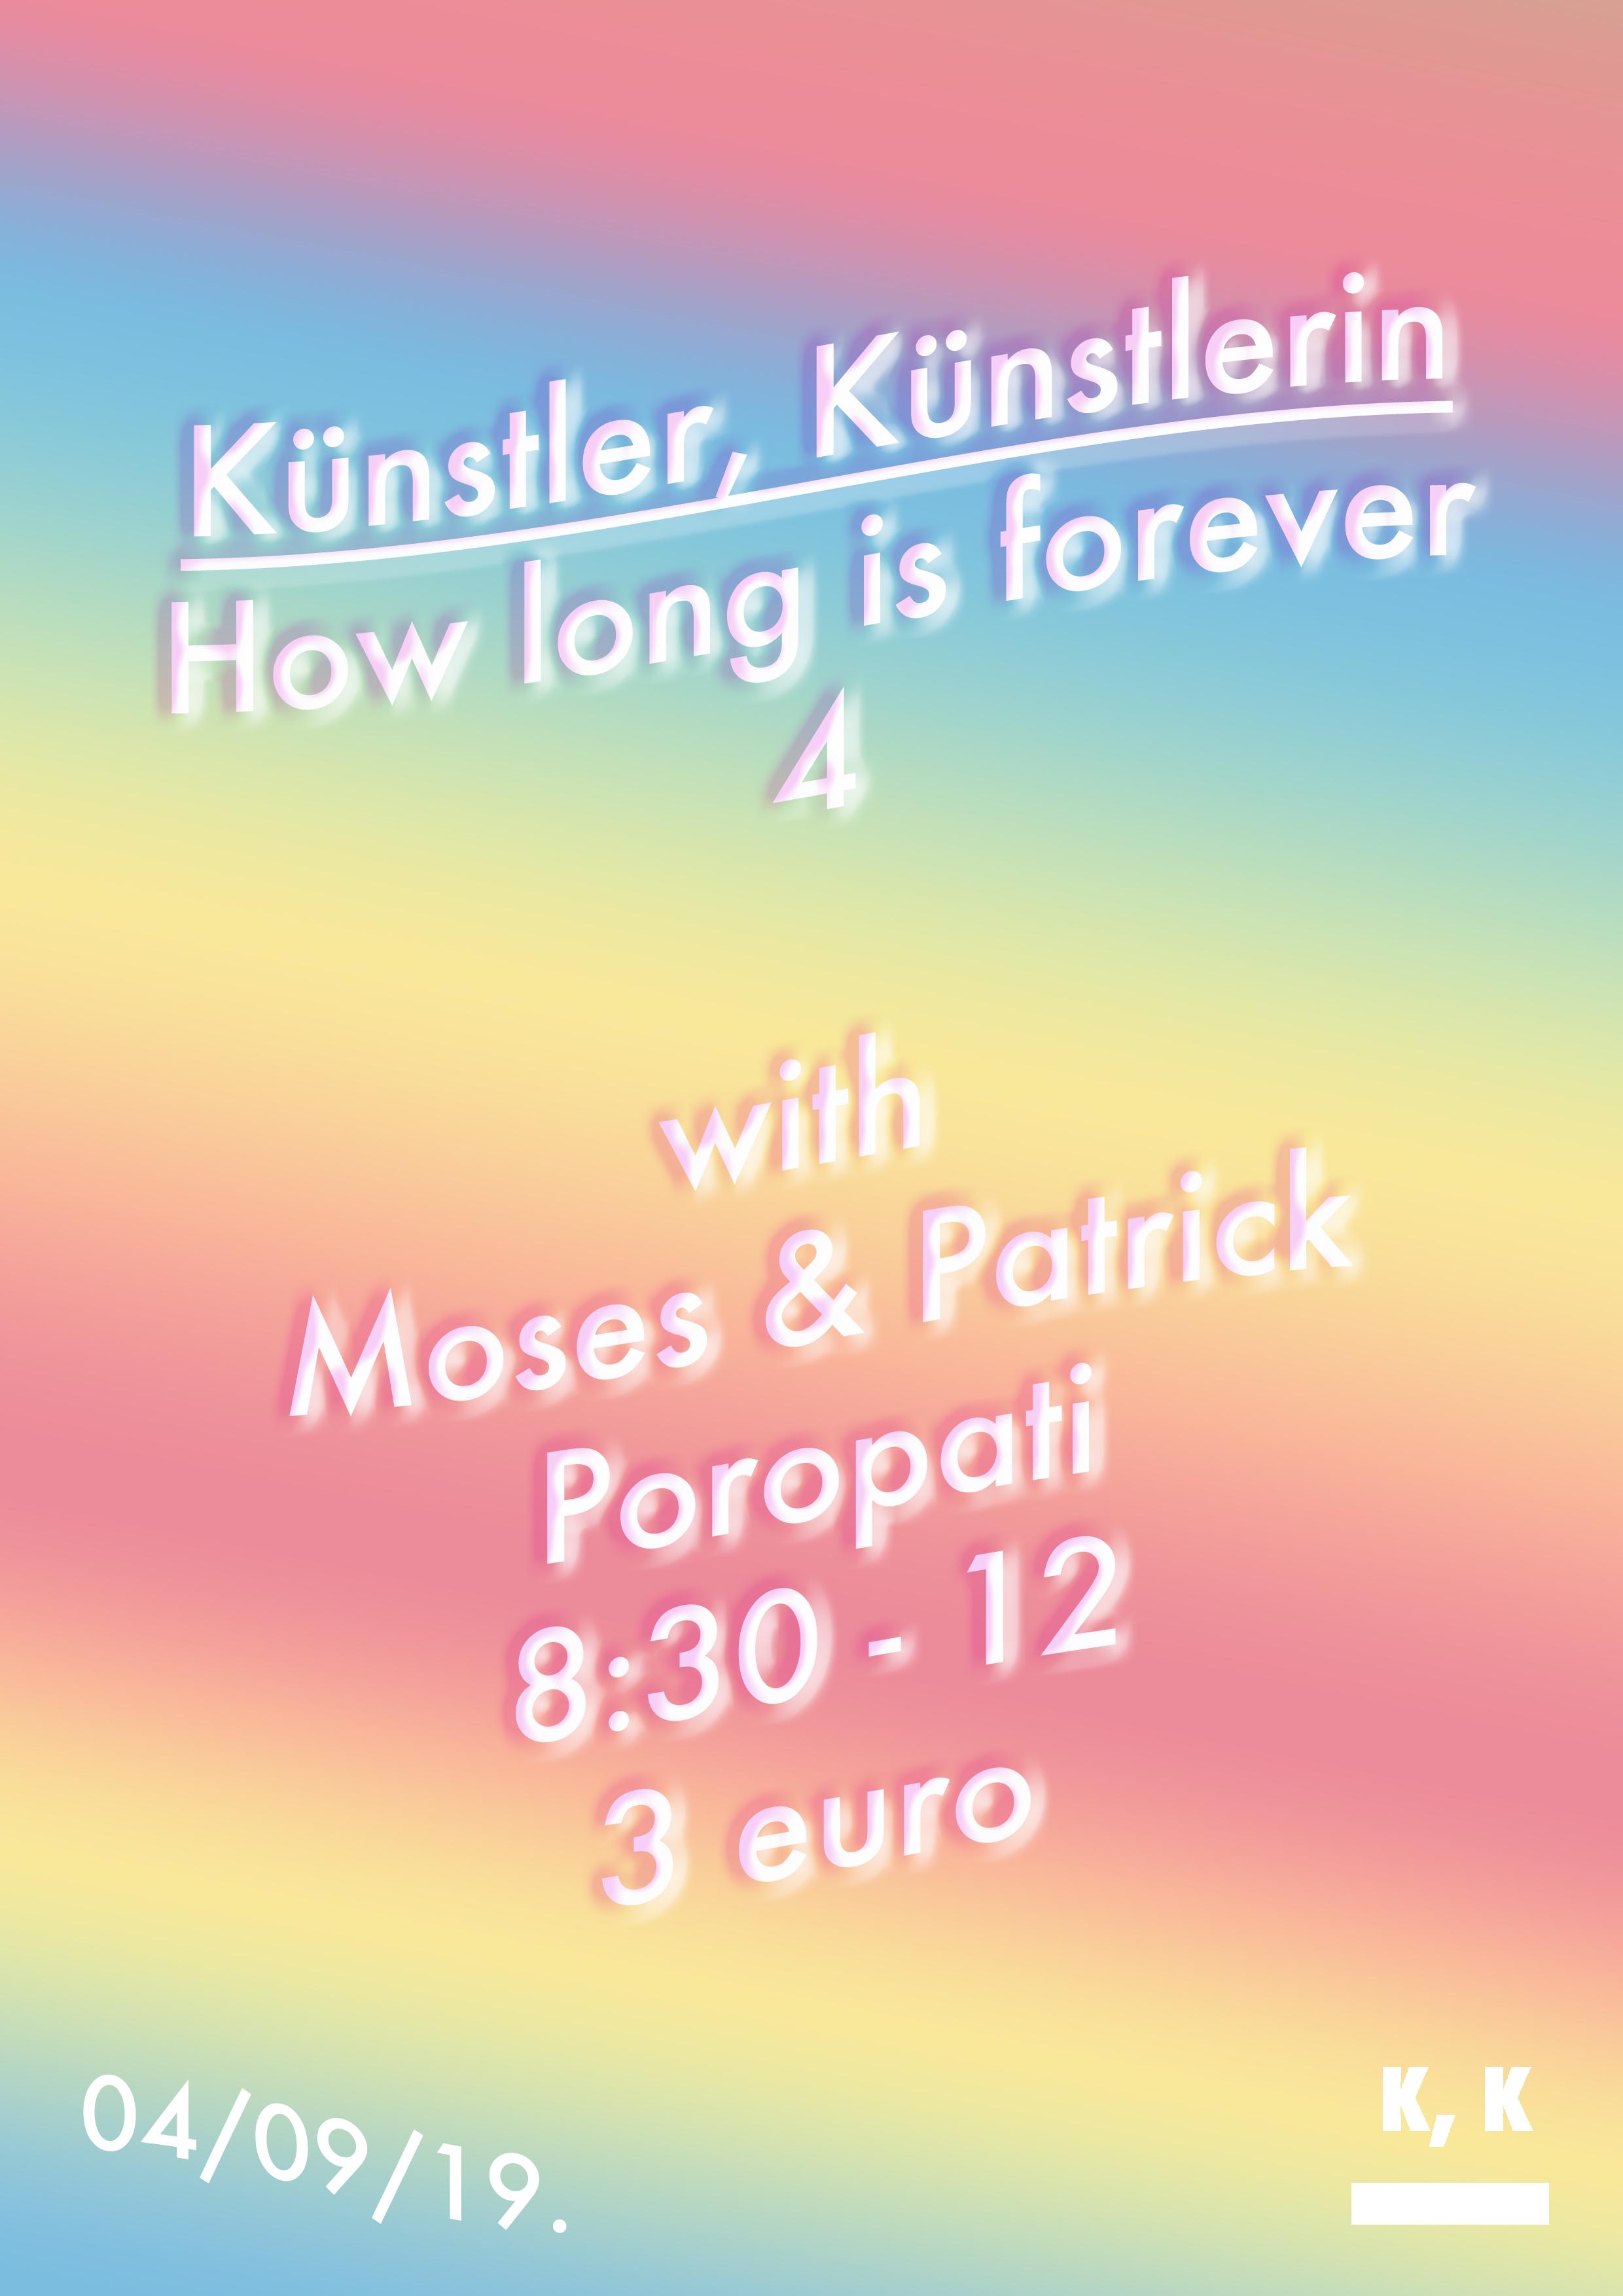 Kunstler, Kunstlerin, How long is forever 4 with Moses and Patrick.jpg